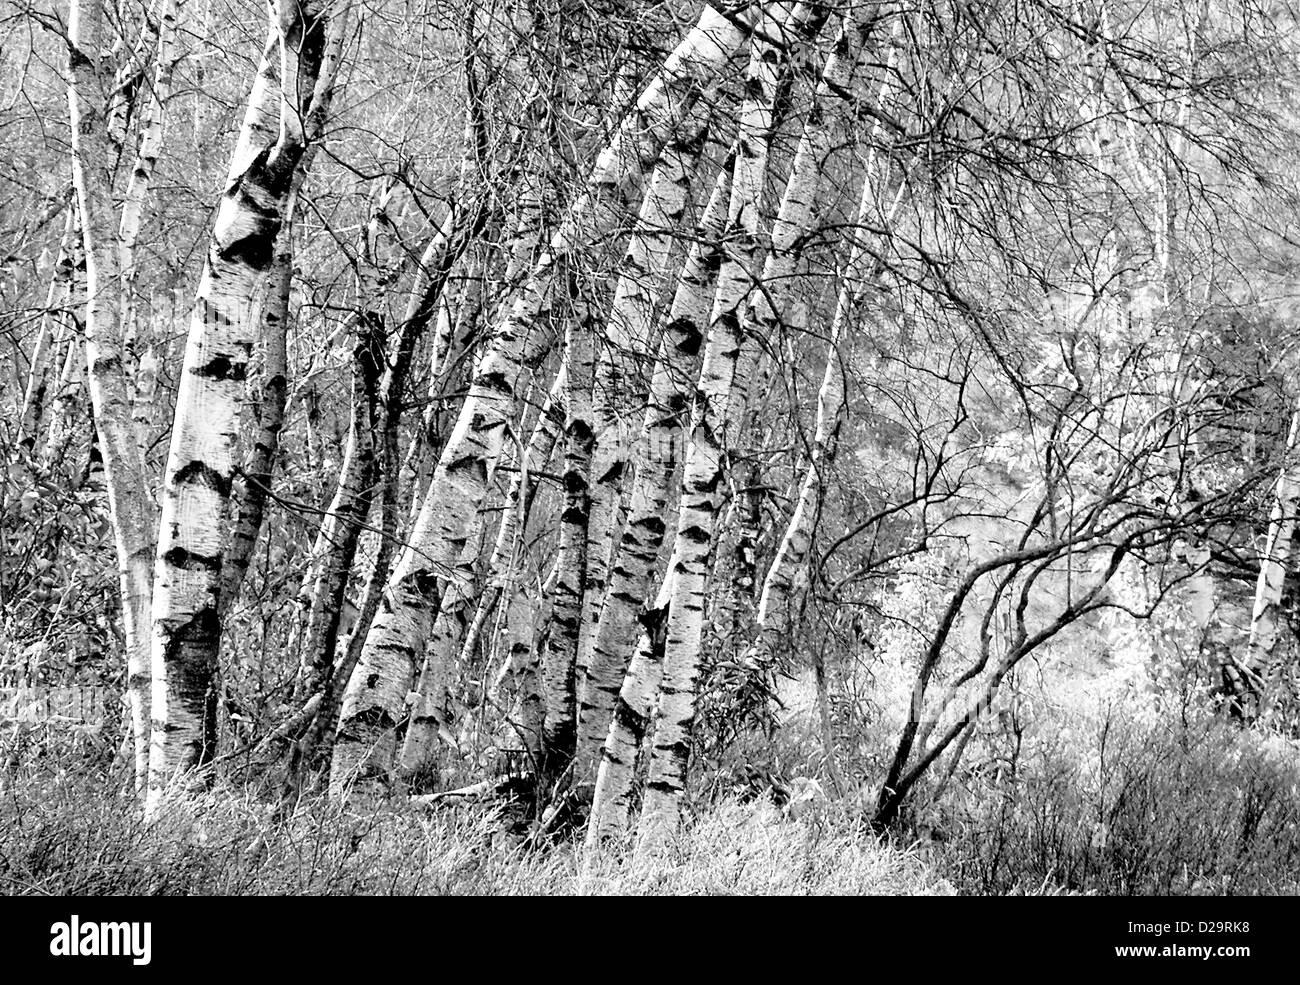 Birch Trees in Winter - Stock Image